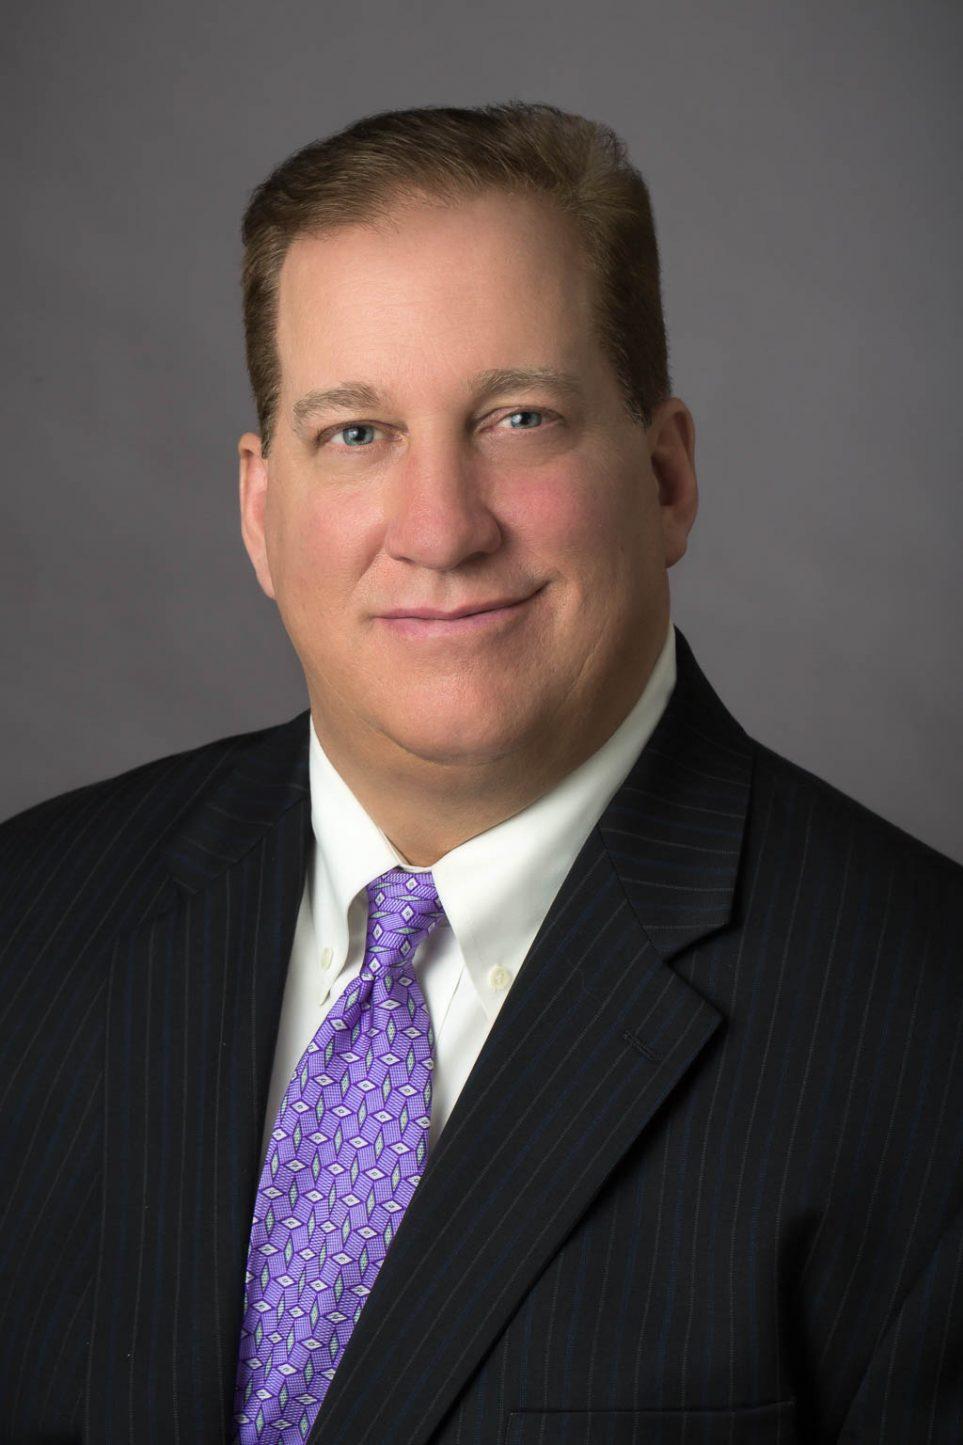 Male Portrait Gray Background Purple Tie